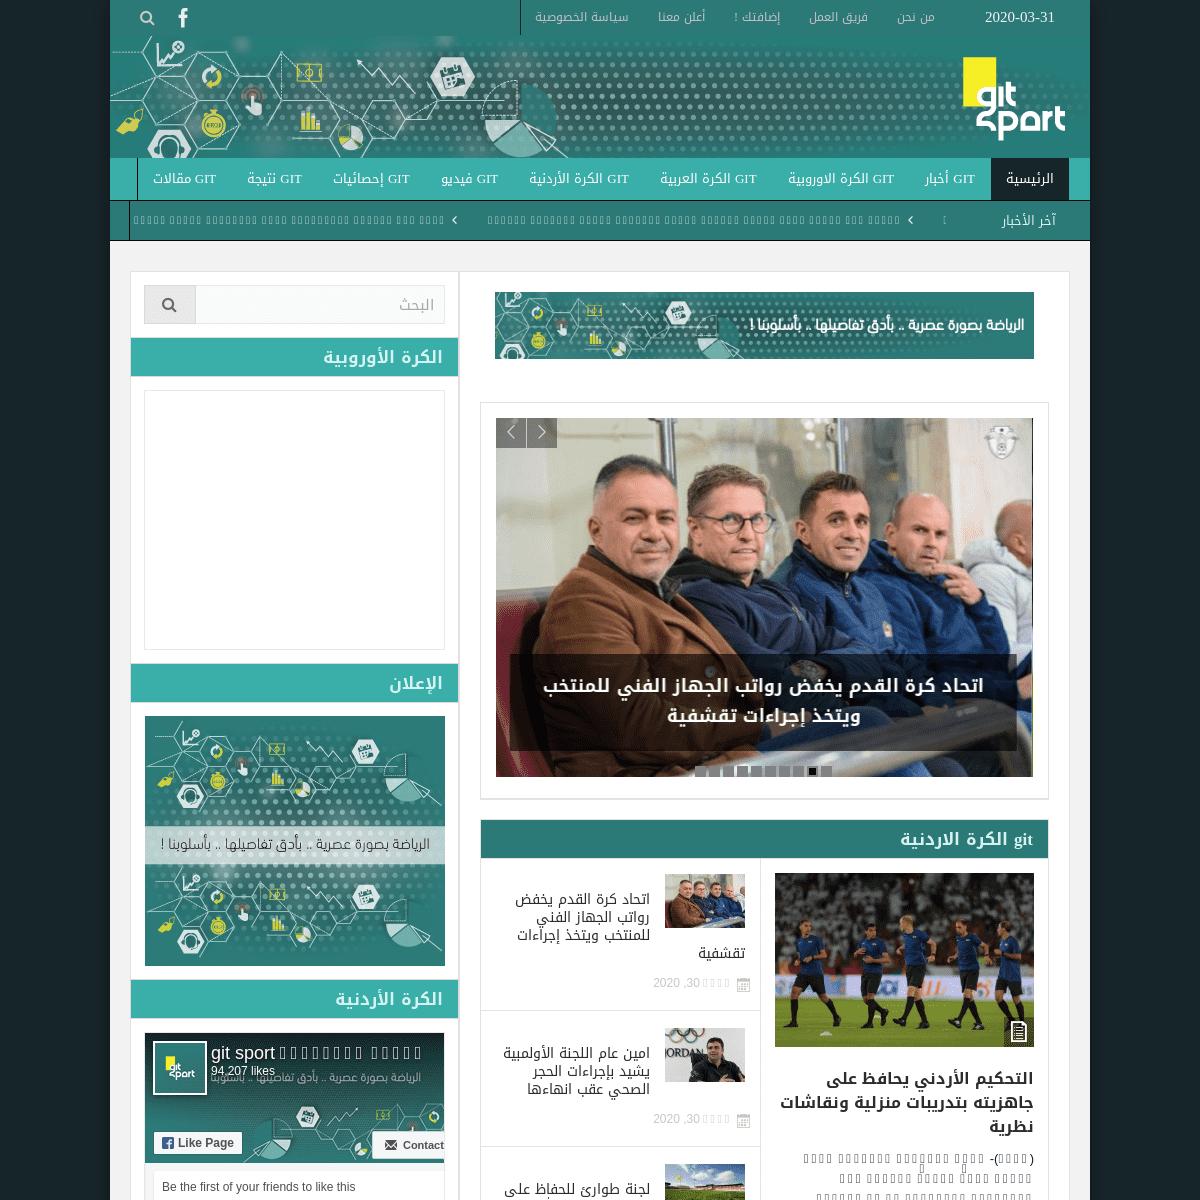 ArchiveBay.com - gitsport.net - git sport - عالم اخر من الرياضة والإحصائيات